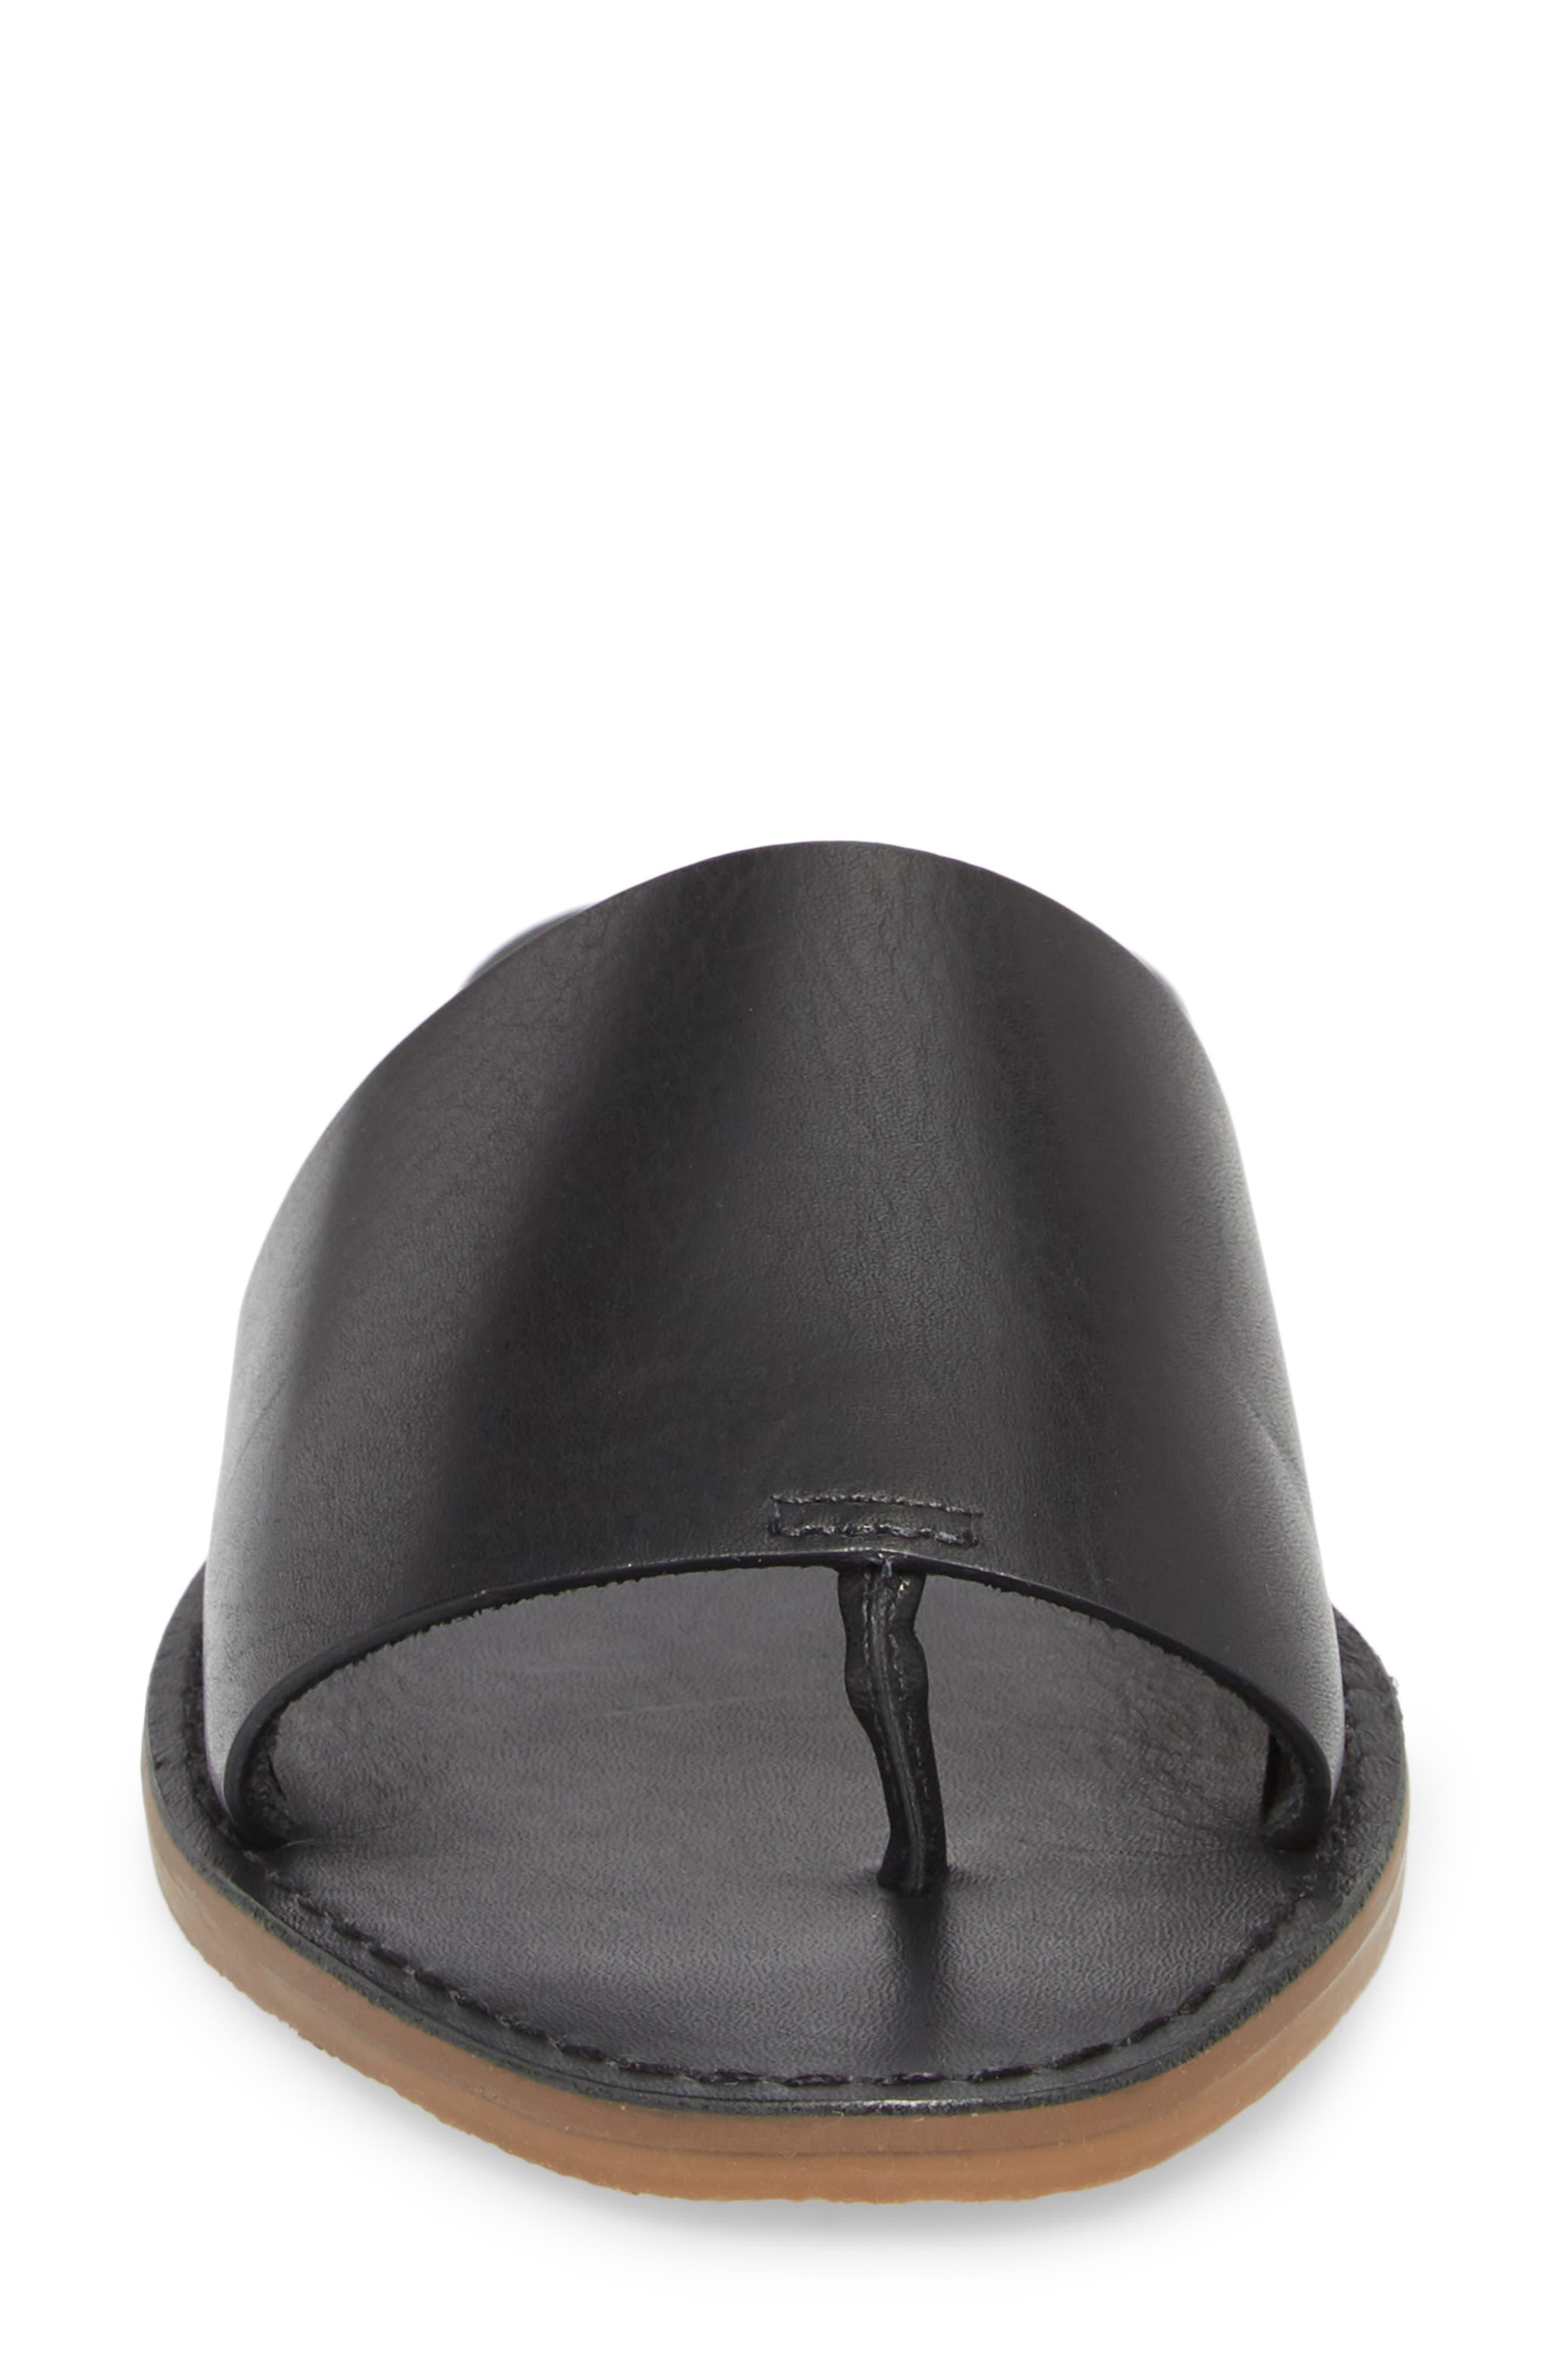 MADEWELL, Boardwalk Post Slide Sandal, Alternate thumbnail 4, color, TRUE BLACK LEATHER